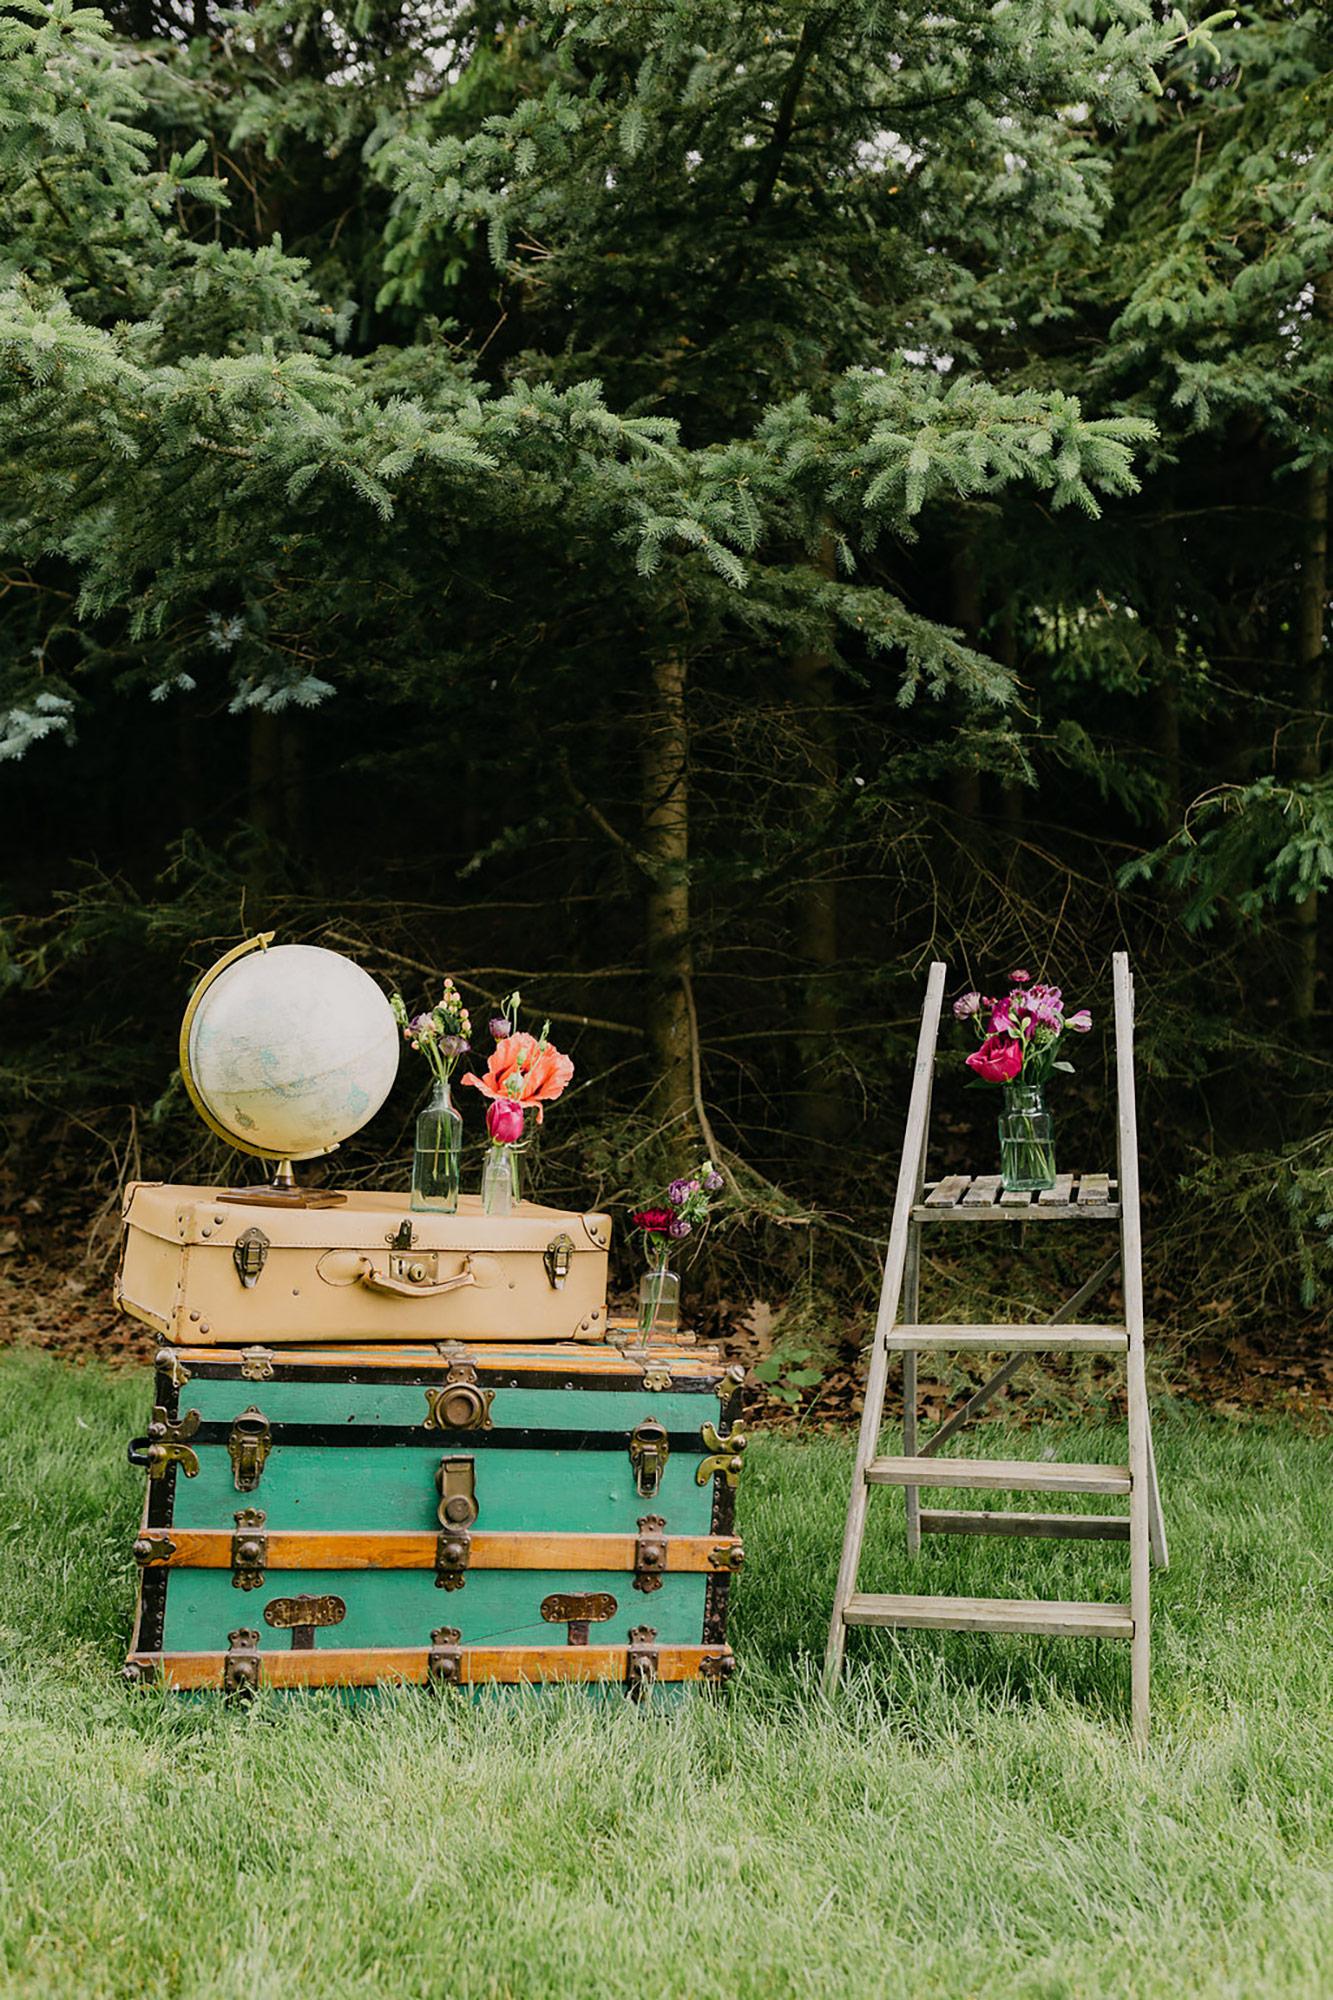 Kurtz-Orchards-Wedding-Niagara-wedding-Vineyard-Bride-Photography-by-Kayla-Rocca-013.JPG